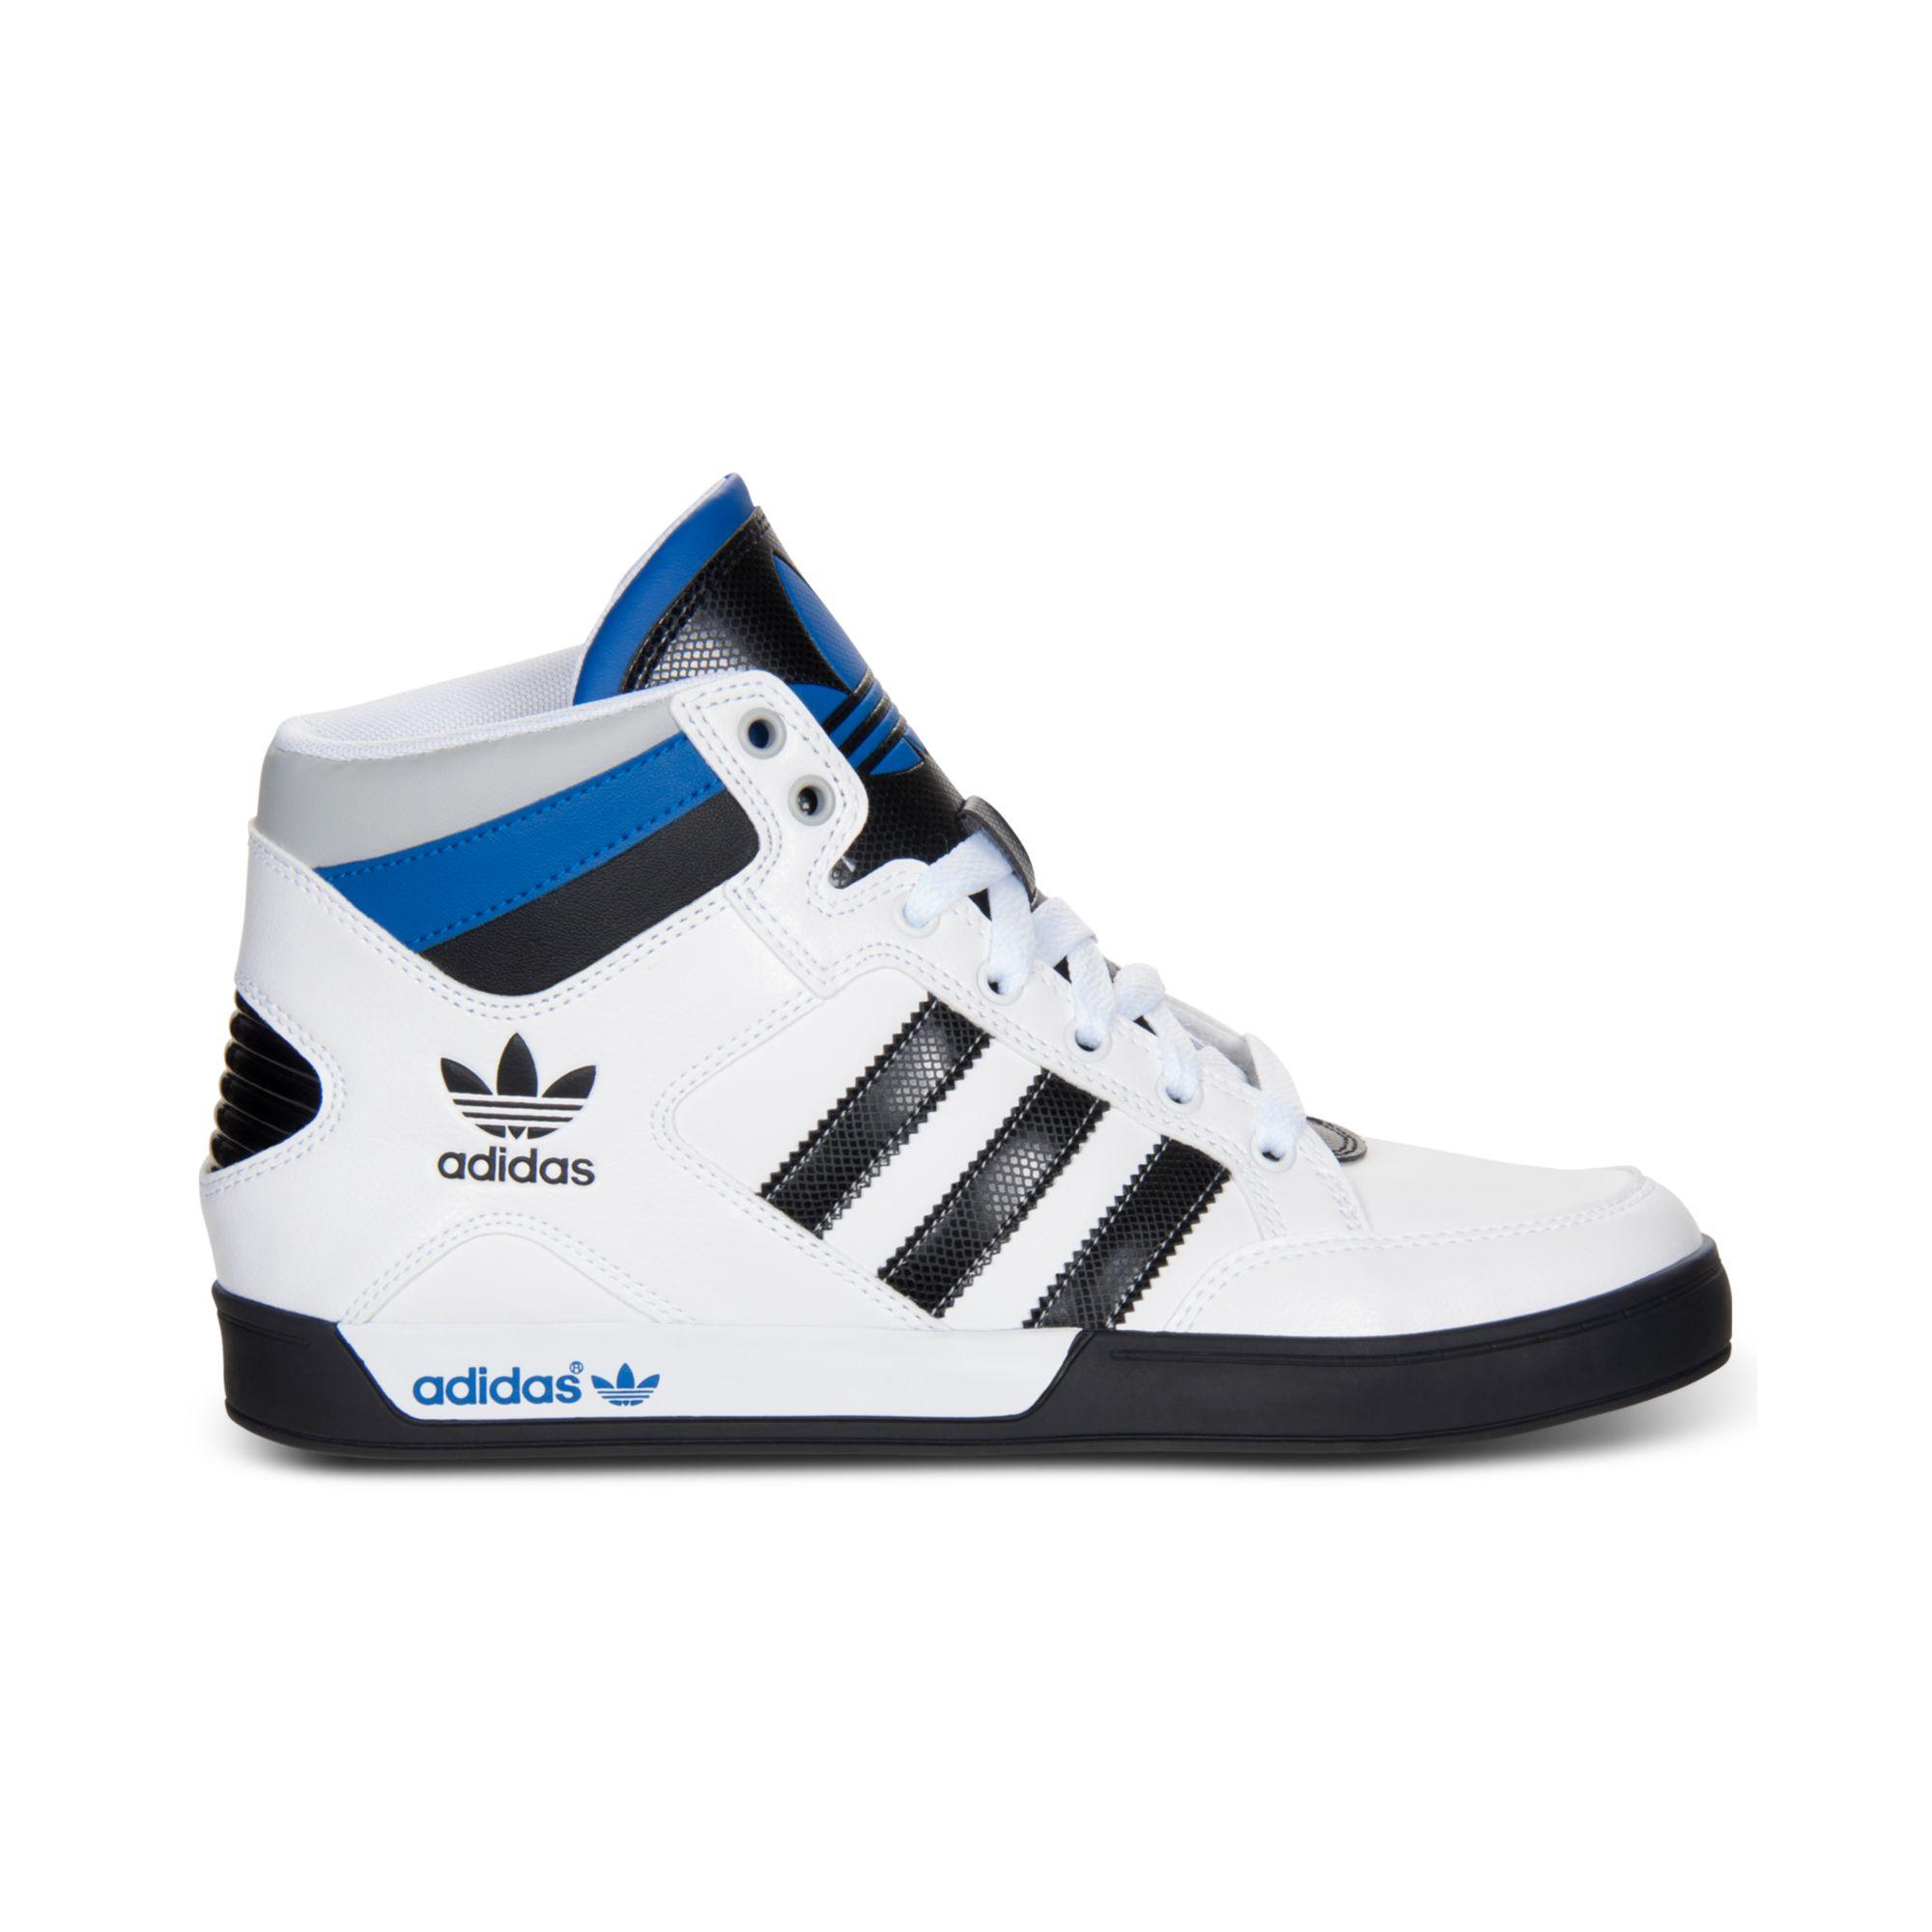 Adidas Casual Mens Shoes Strap